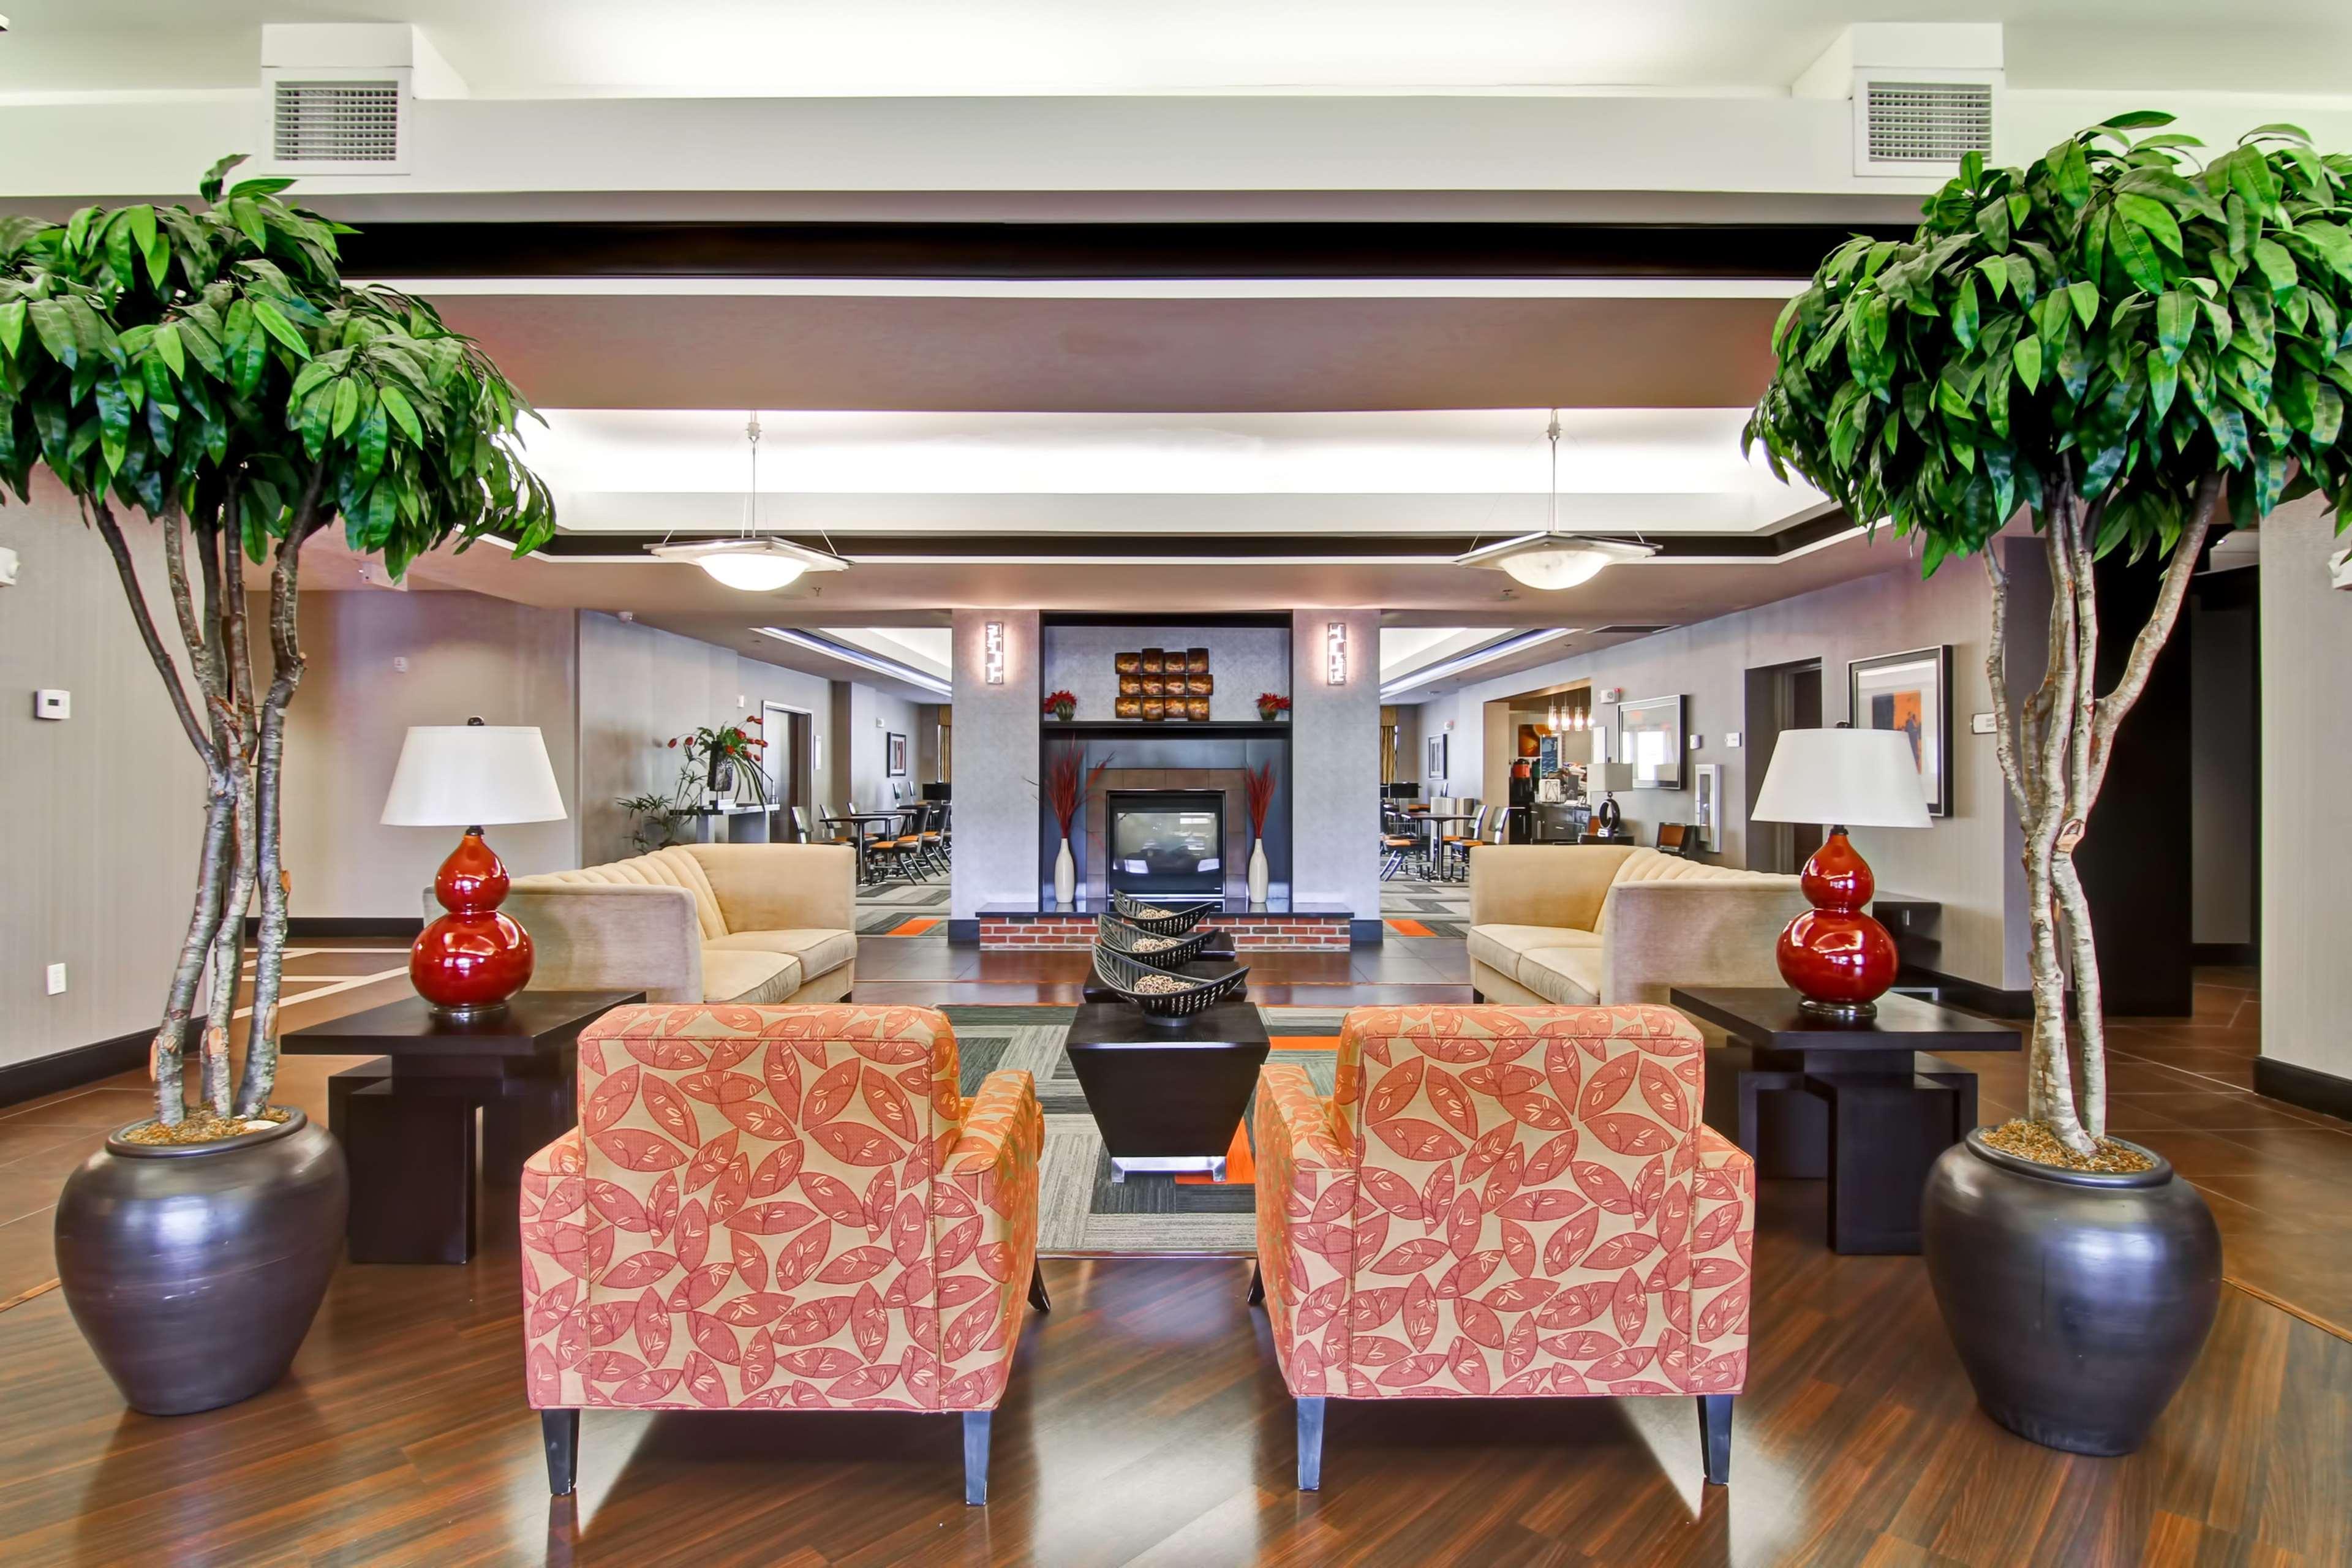 Homewood Suites by Hilton Cincinnati Airport South-Florence image 2